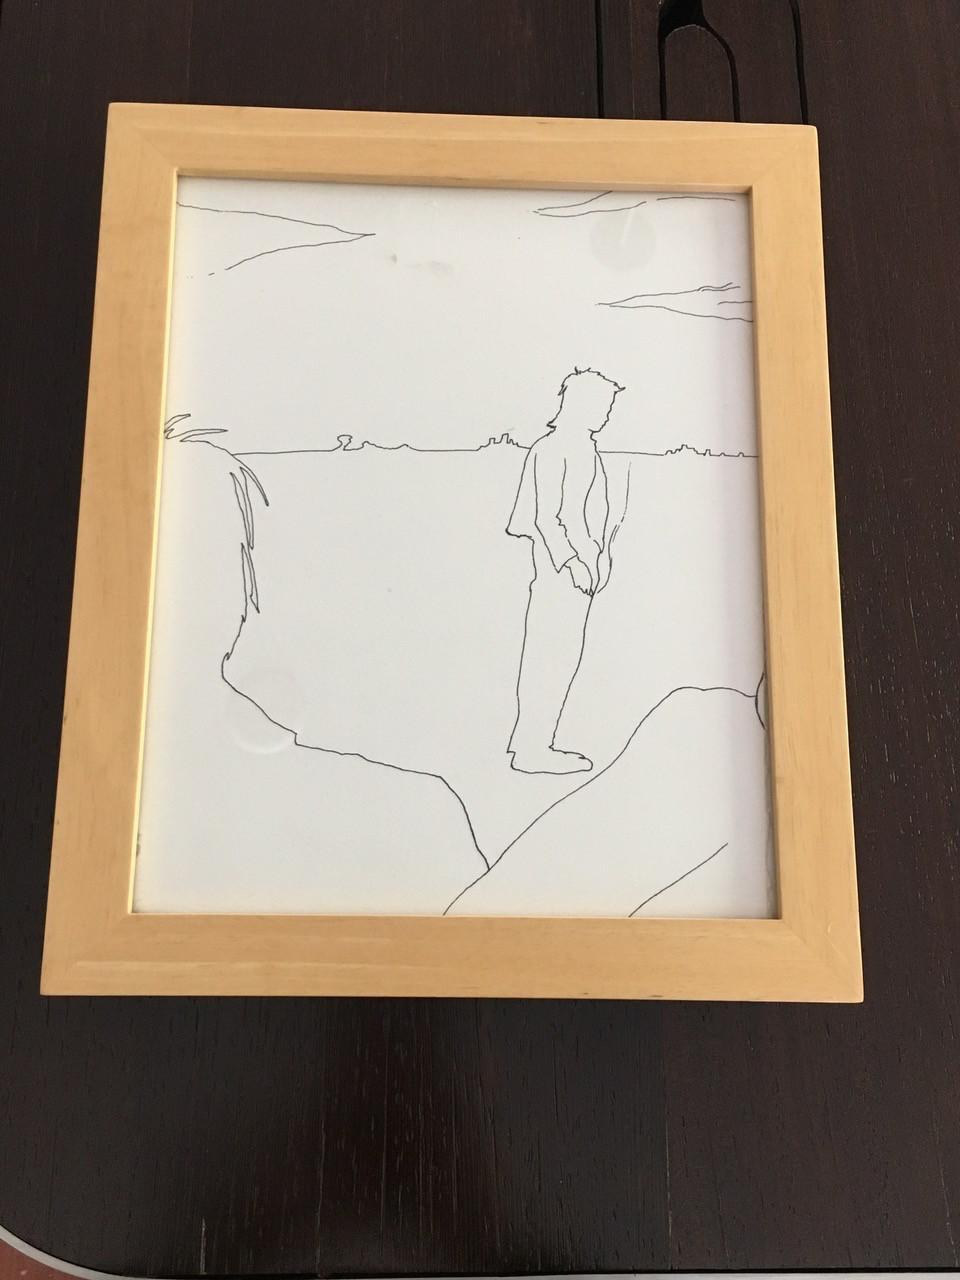 Doug Aitken's drawing, created when he was a teen.